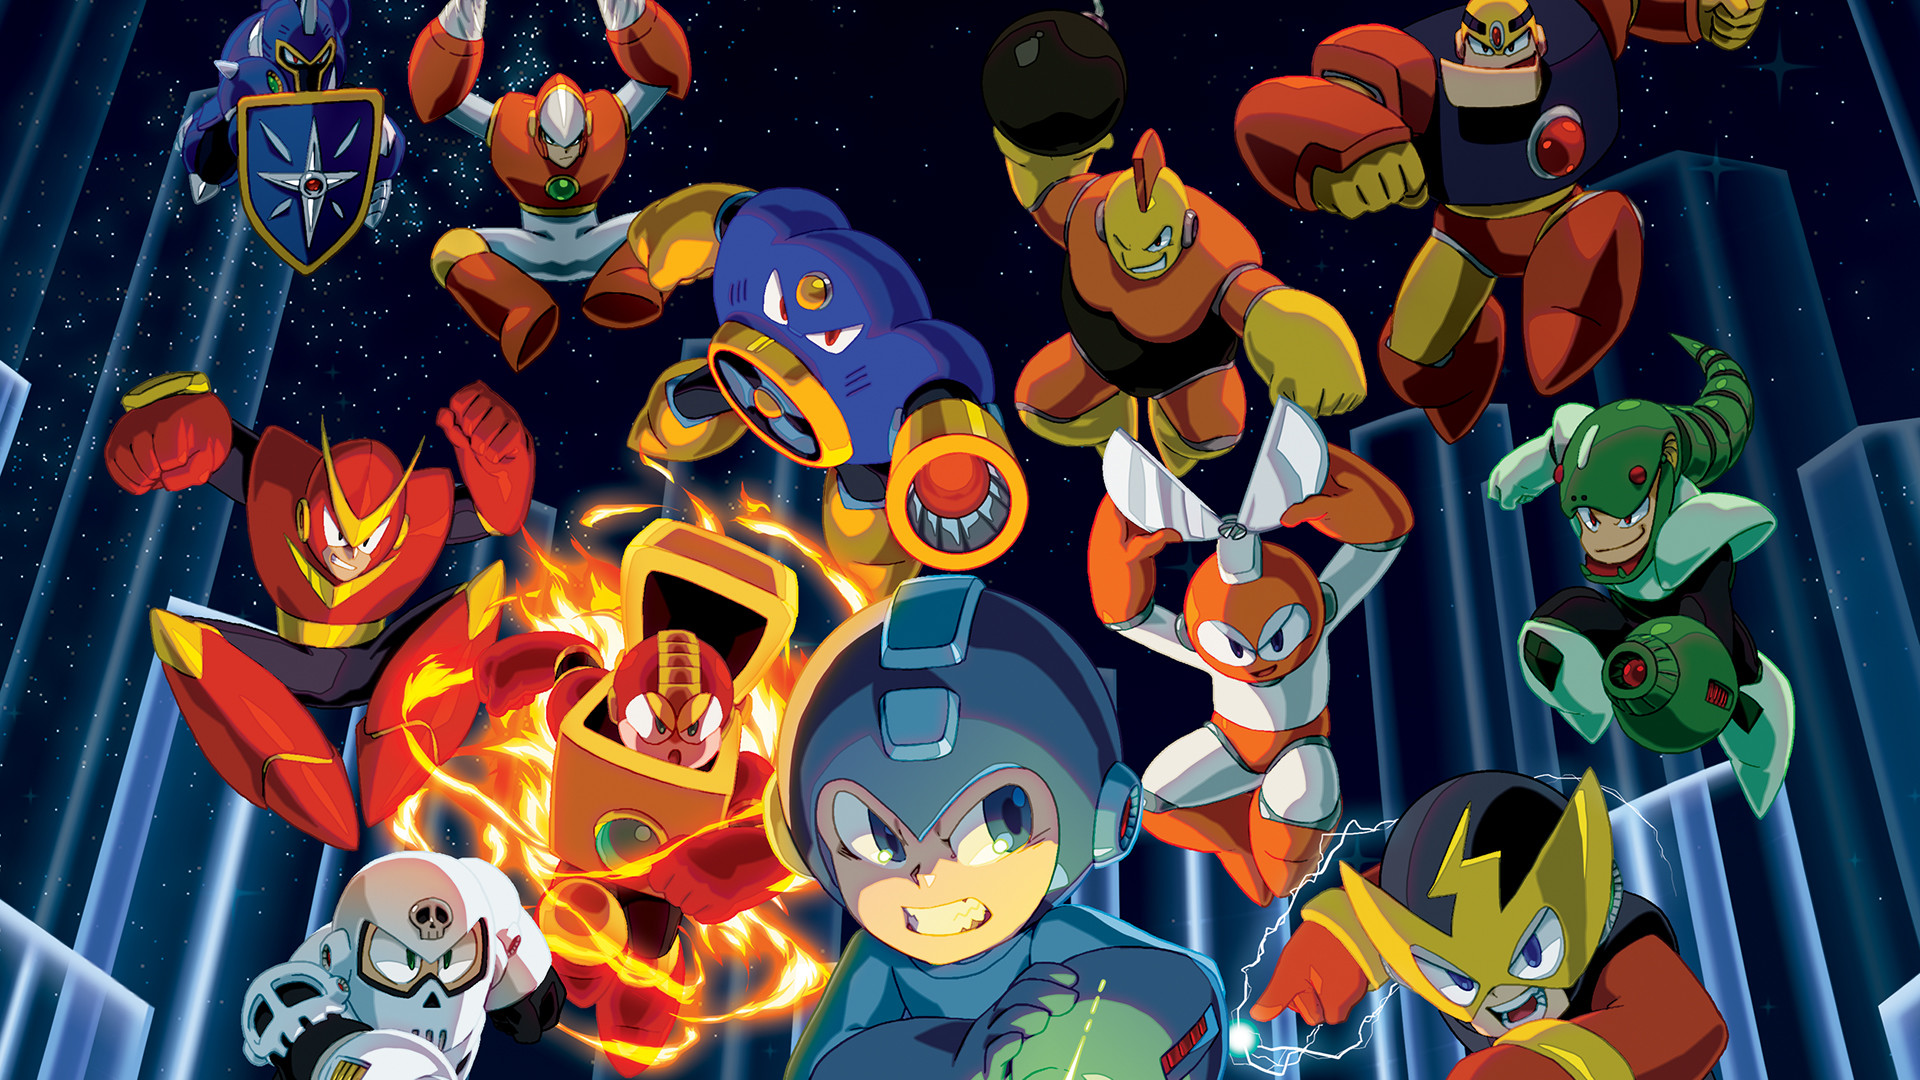 Mega Man Legacy Collection – Wallpaper 1 by seraharcana on DeviantArt